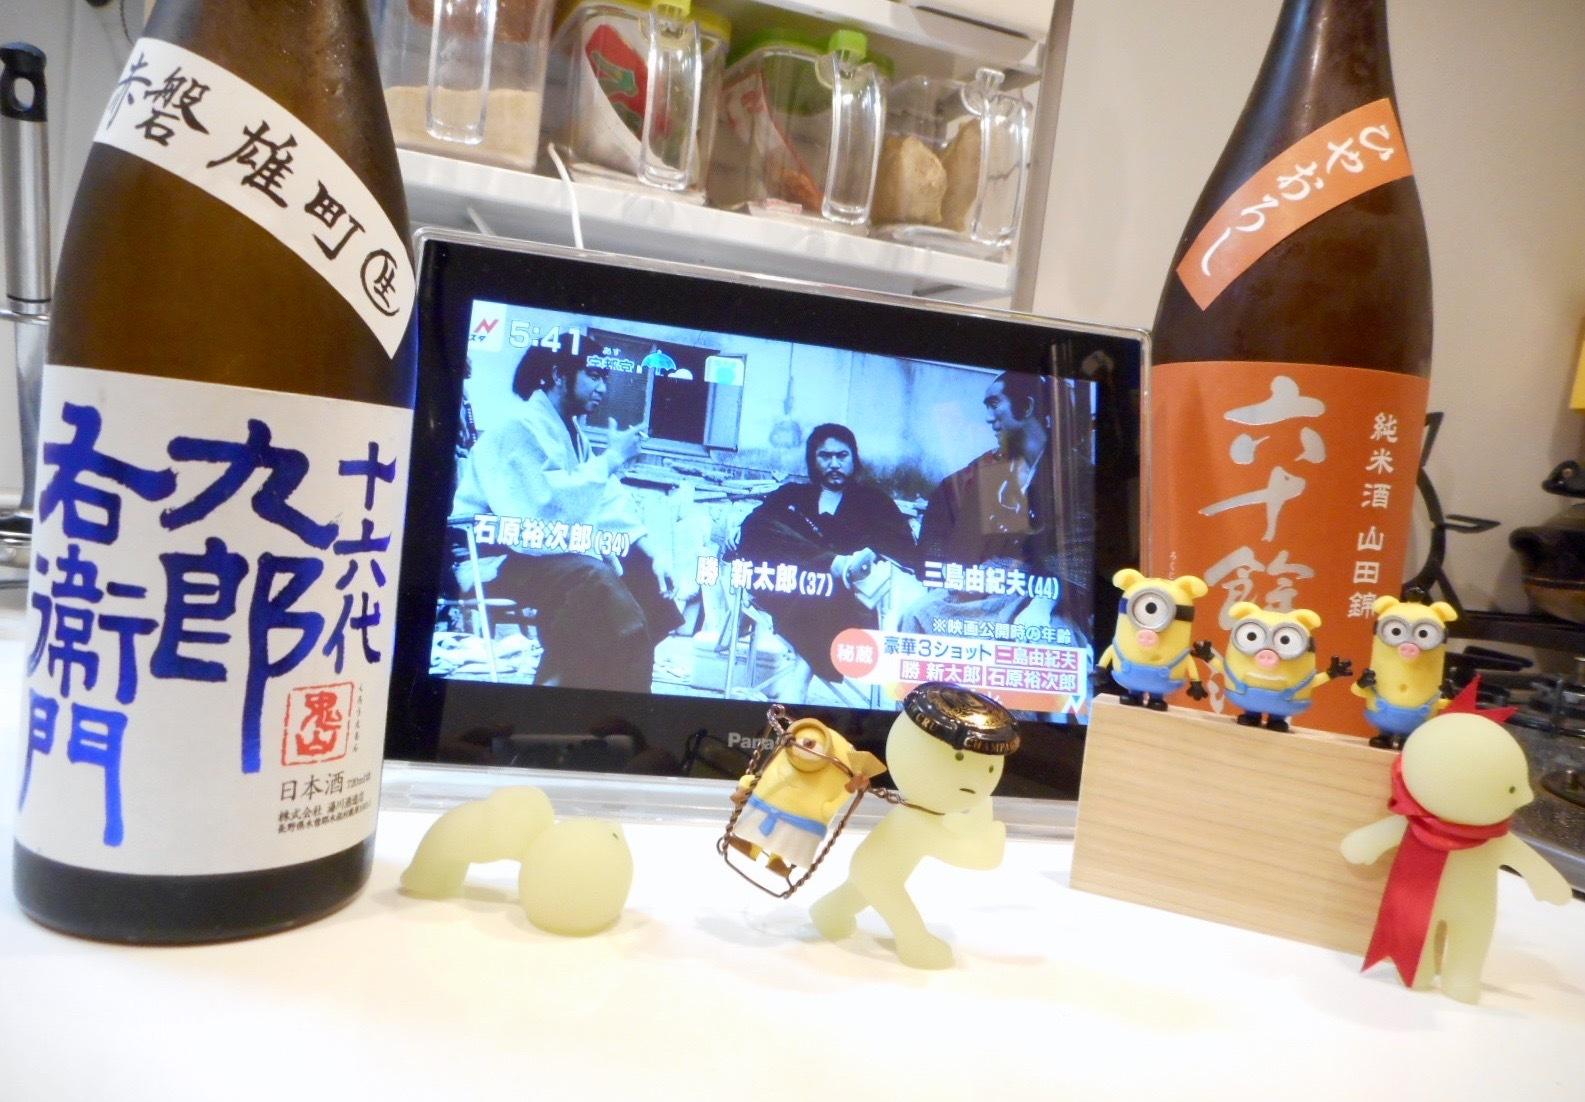 kuroemon_yamahai_omachi28by1.jpg